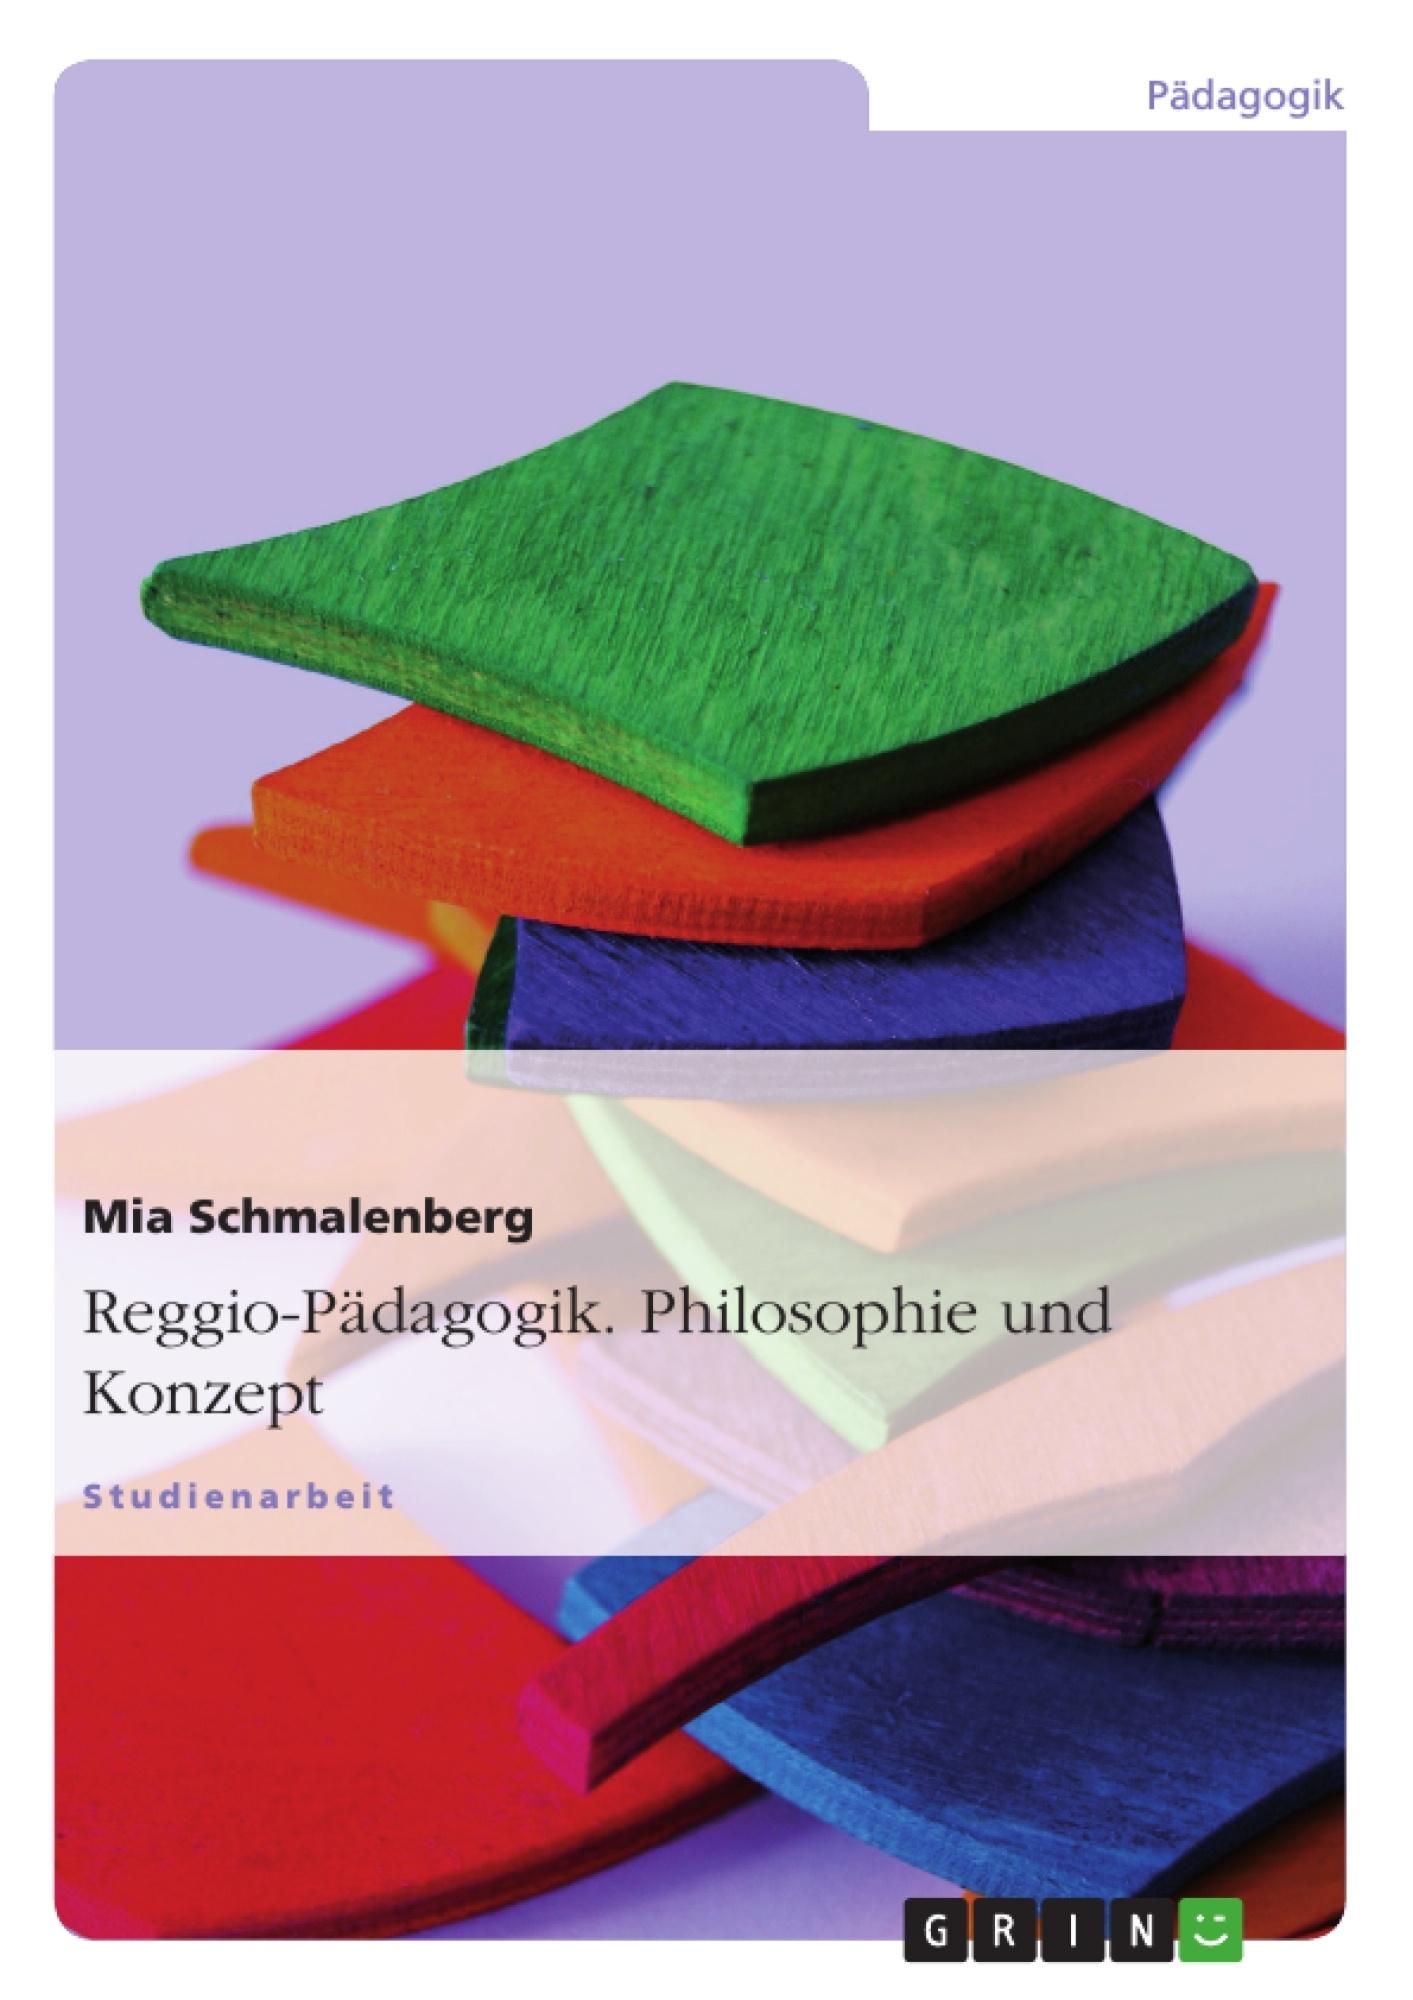 Titel: Reggio-Pädagogik. Philosophie und Konzept